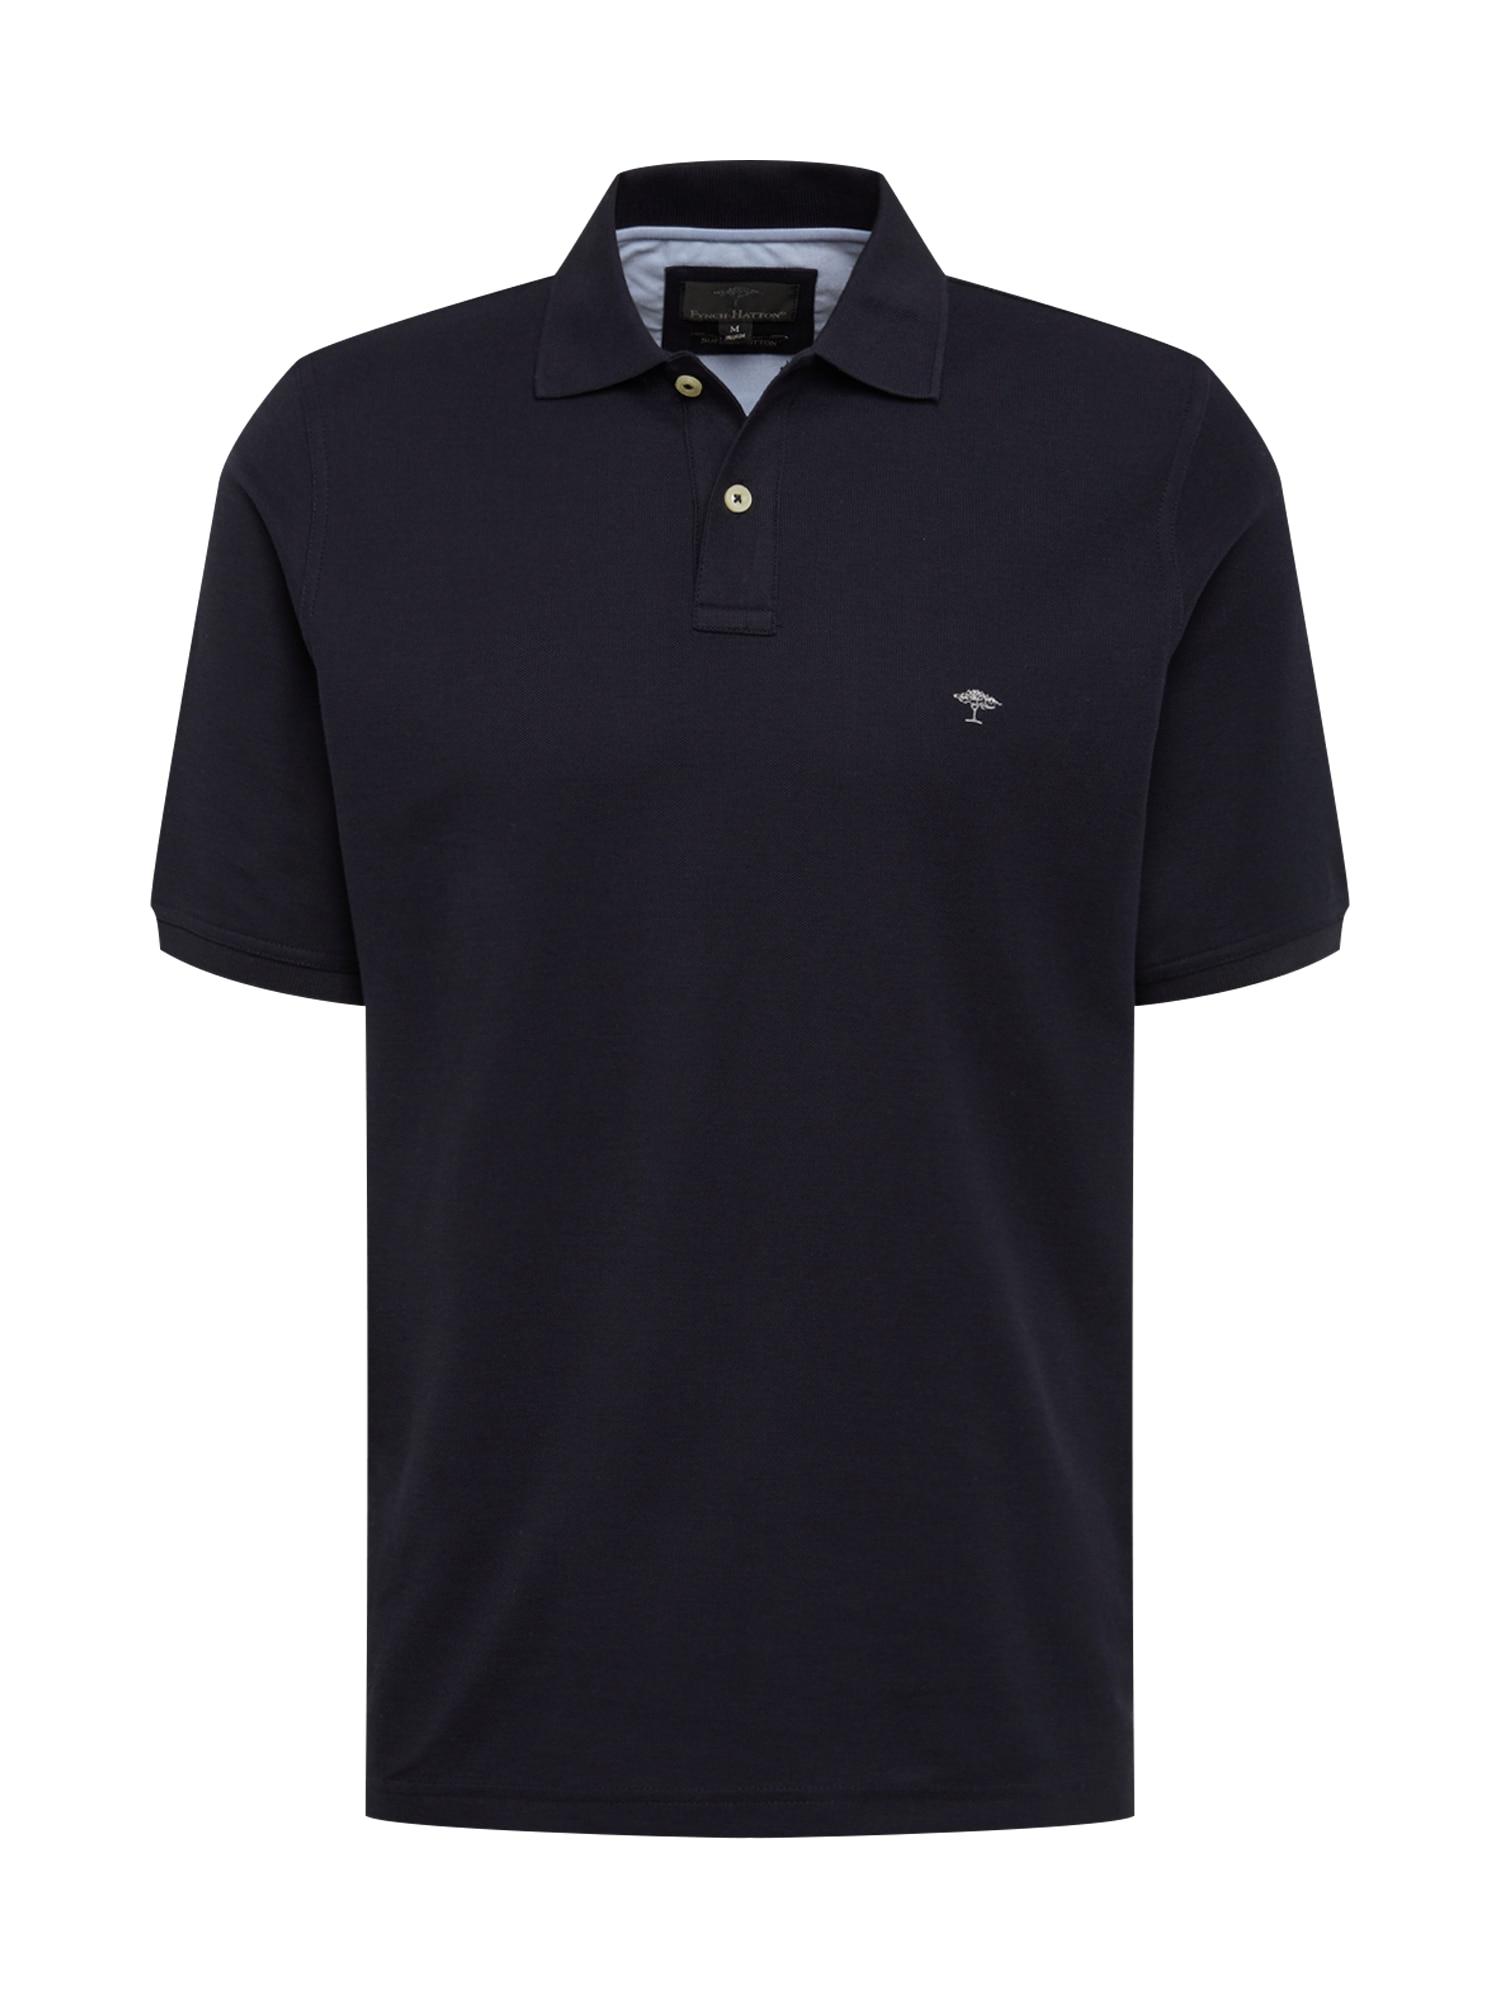 Tričko Polo Basic tmavě modrá FYNCH-HATTON